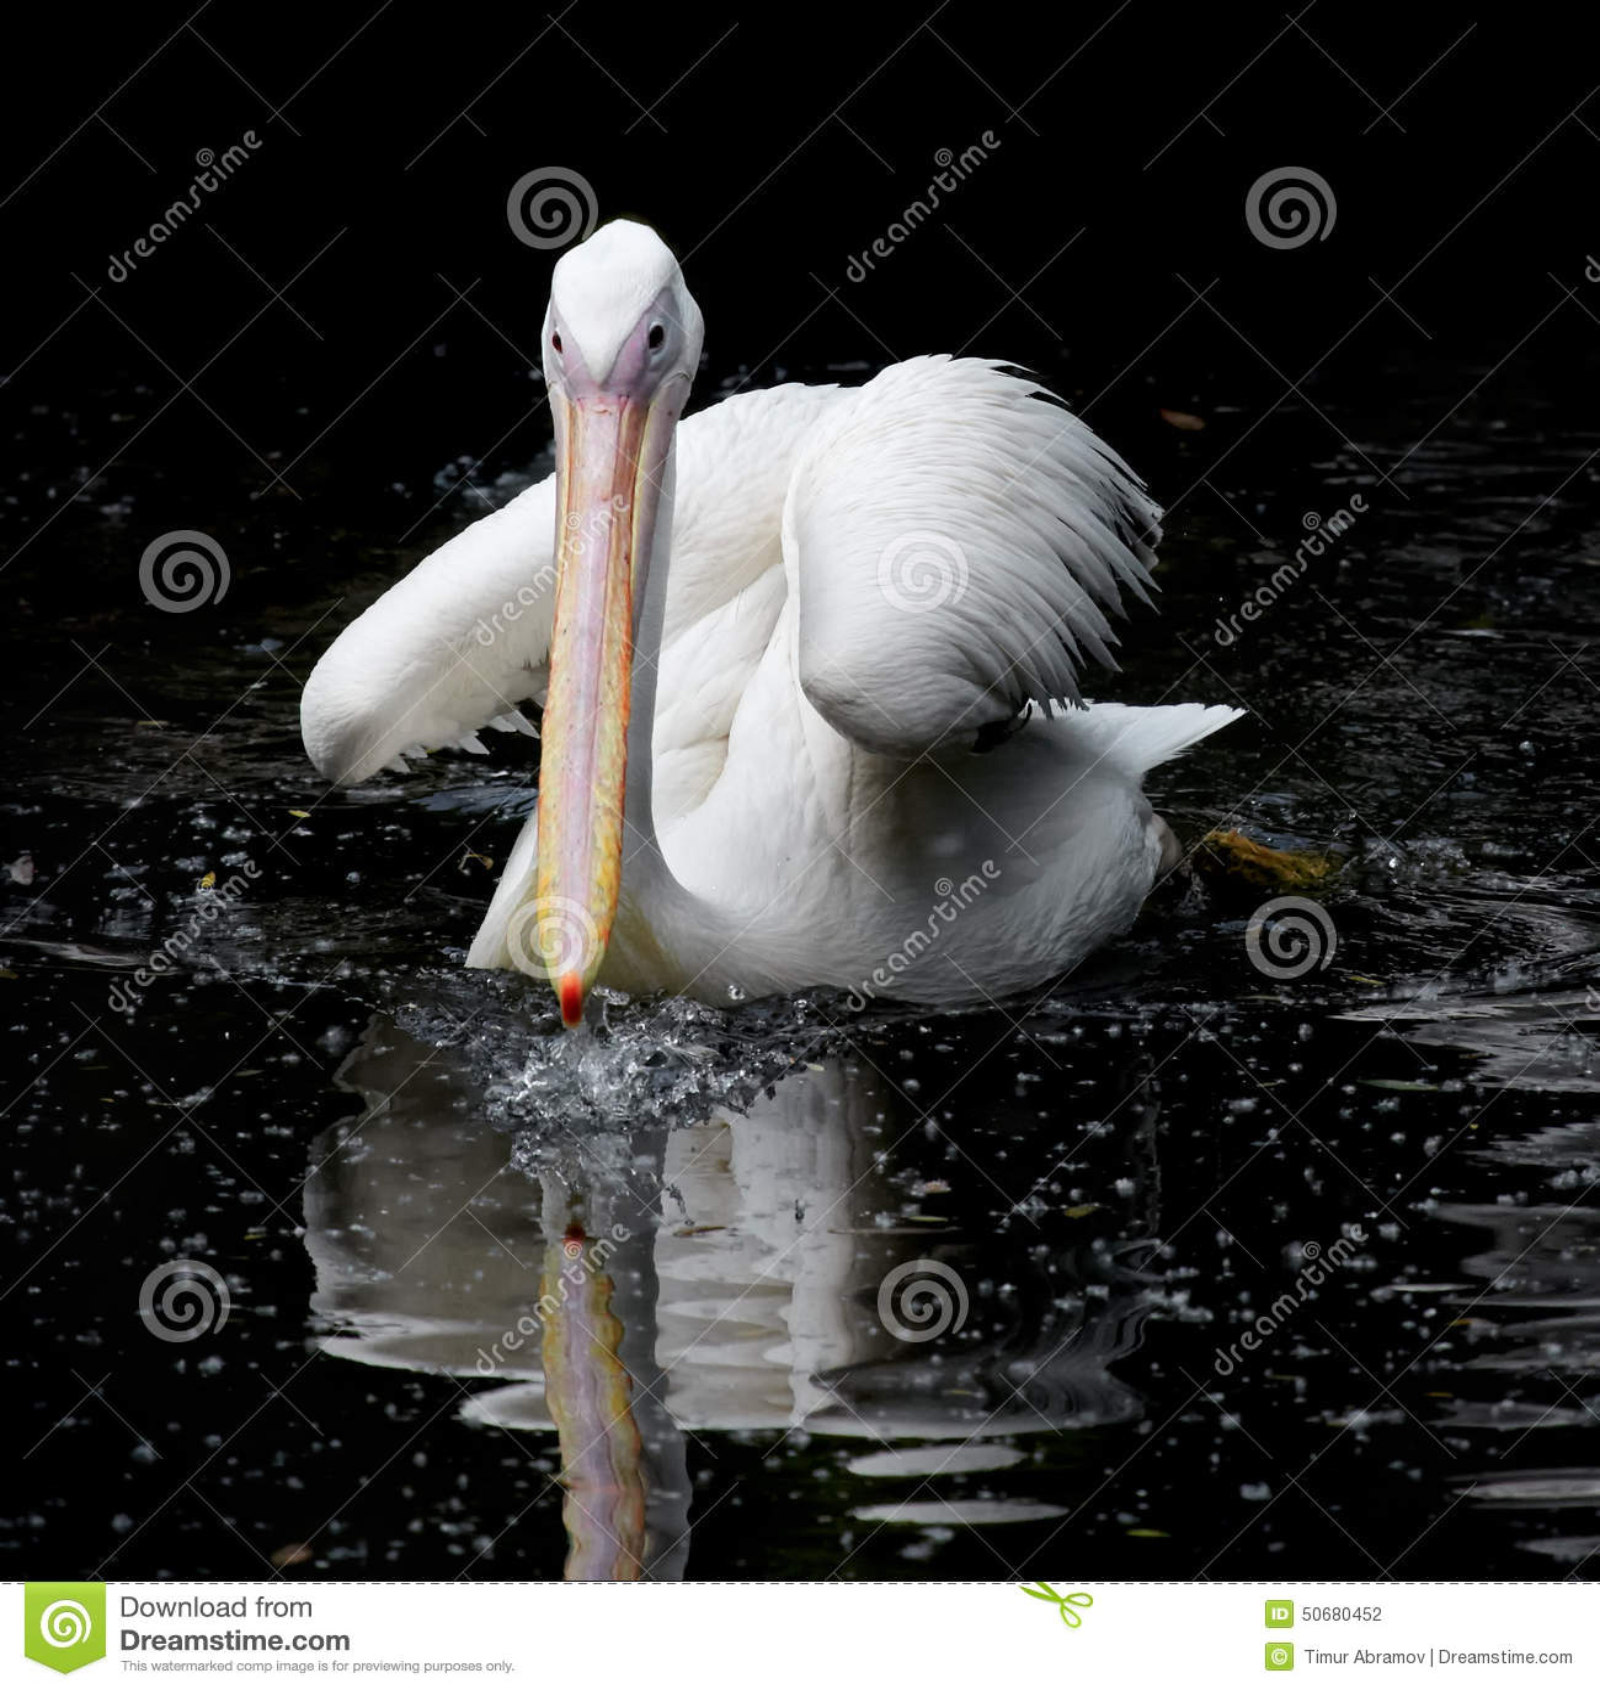 Download 鹈鹕游泳在水中 库存照片. 图片 包括有 庄严, 求知欲, 本质, 茴香, 鹈鹕, 高贵, 眼睛, axeman - 50680452